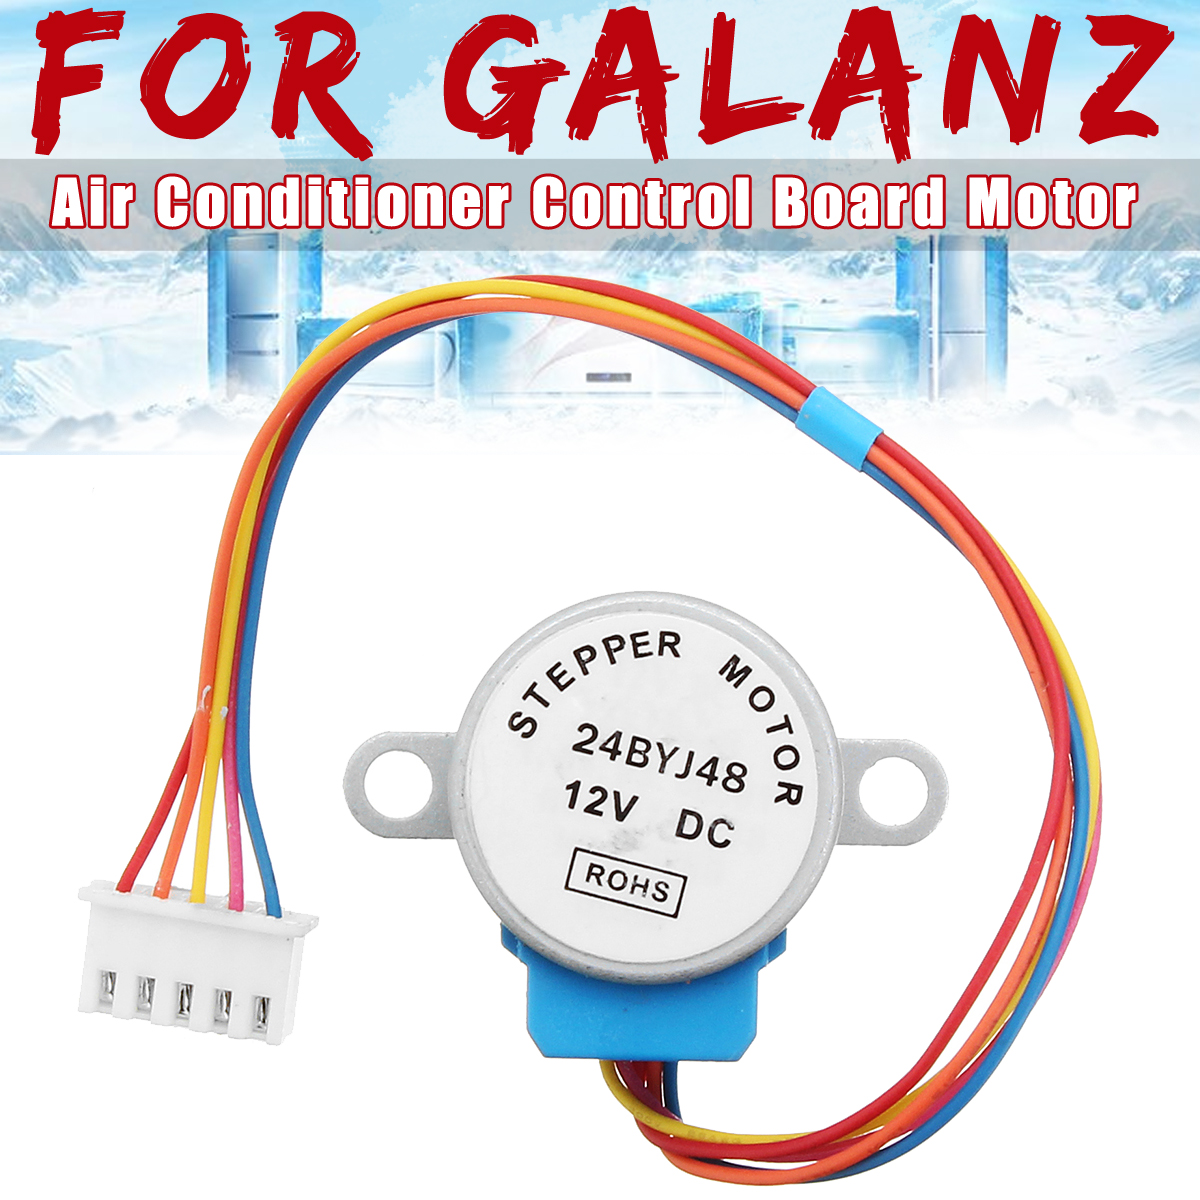 gal12a bd air conditioner control board motor outboard motor metal air conditioner parts for galanz  [ 1200 x 1200 Pixel ]